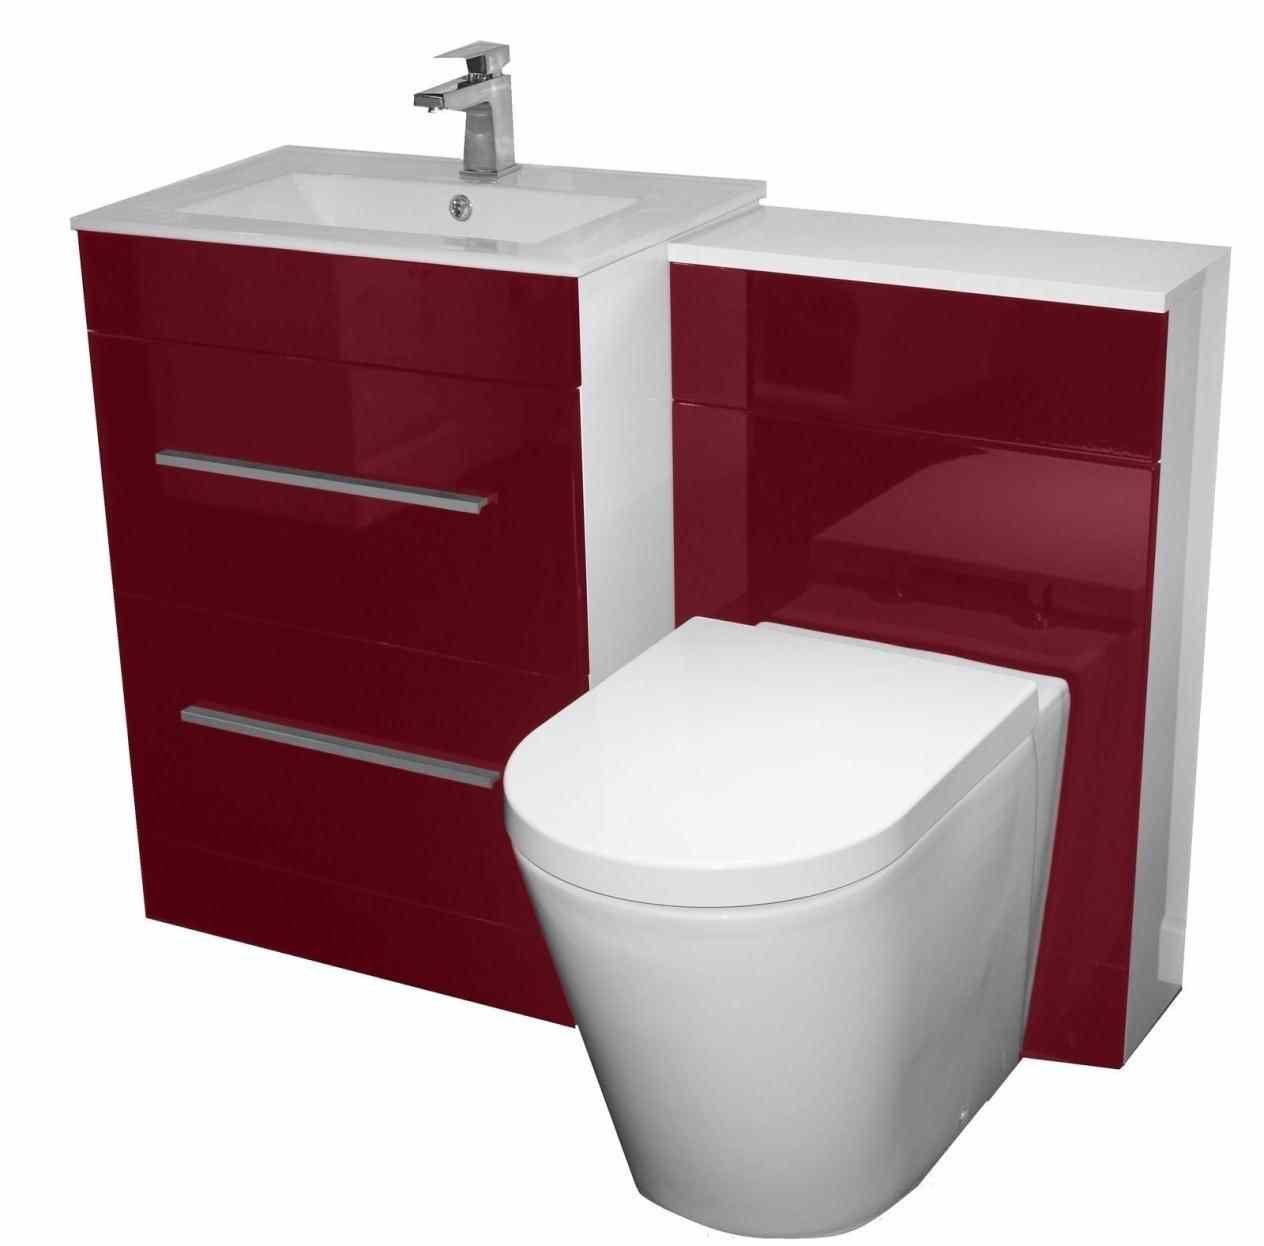 fantastic oakley bathroom sink decoration-Excellent Oakley Bathroom Sink Concept